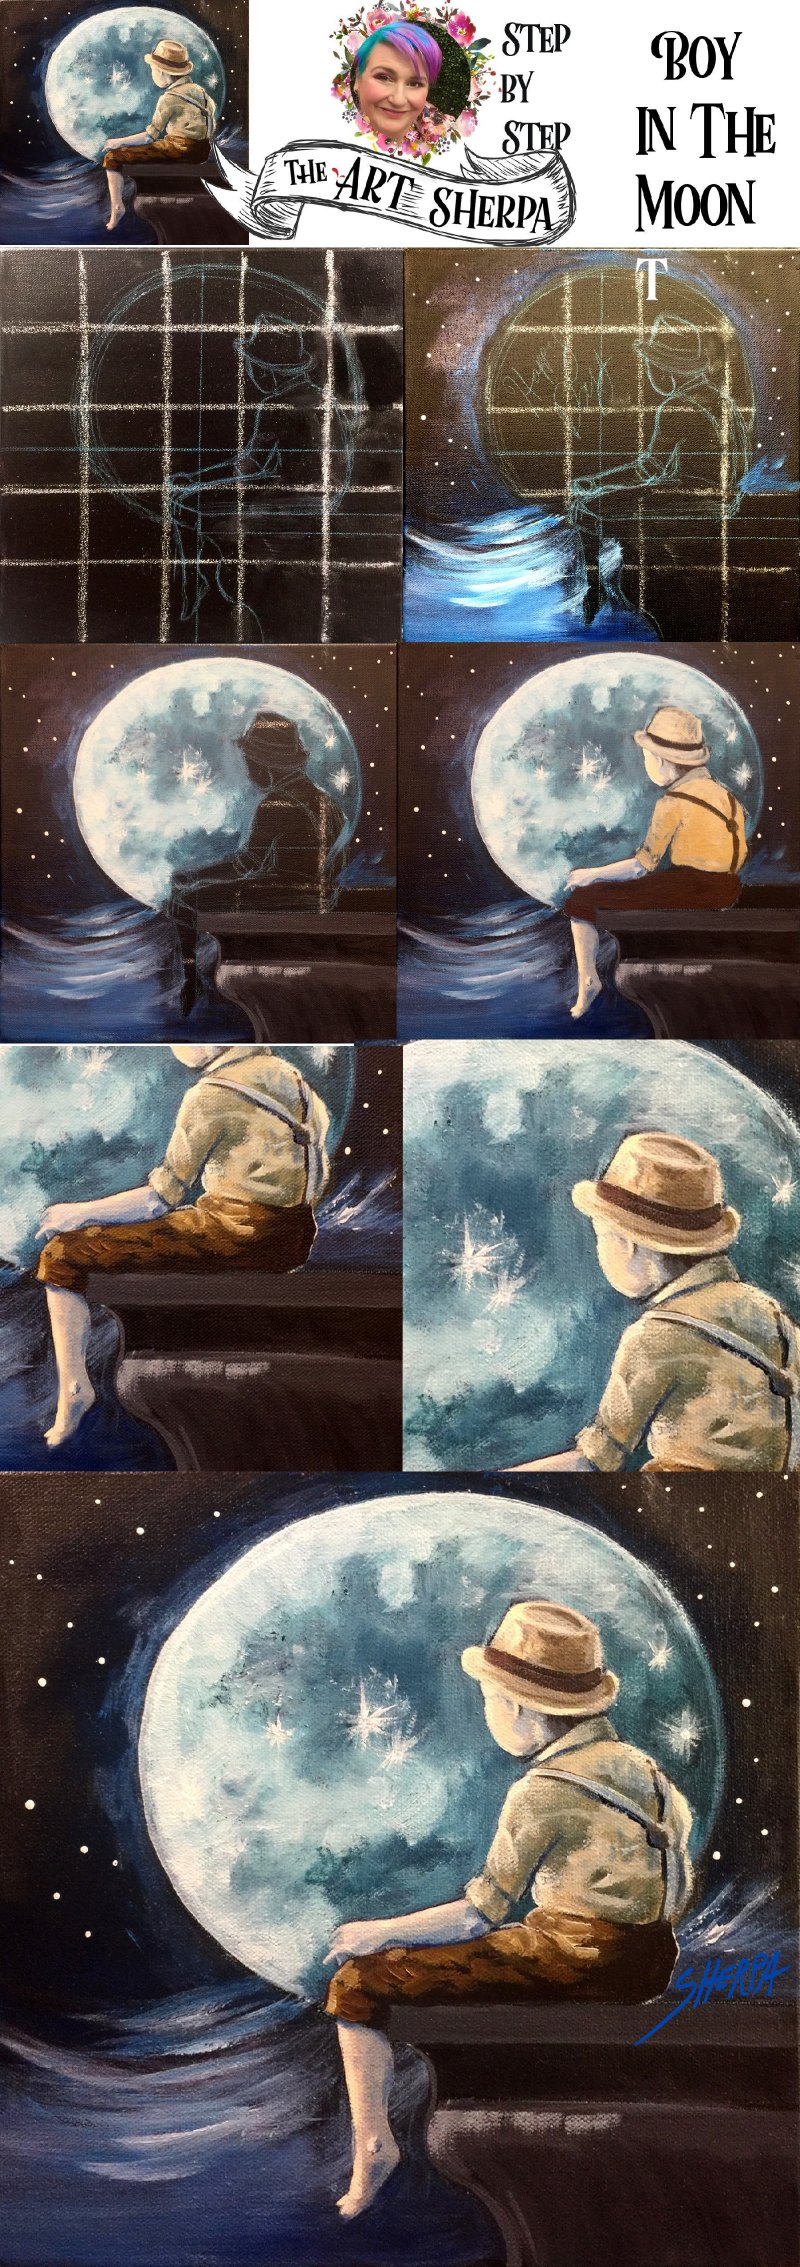 Boy in The moon step by step blank .jpg